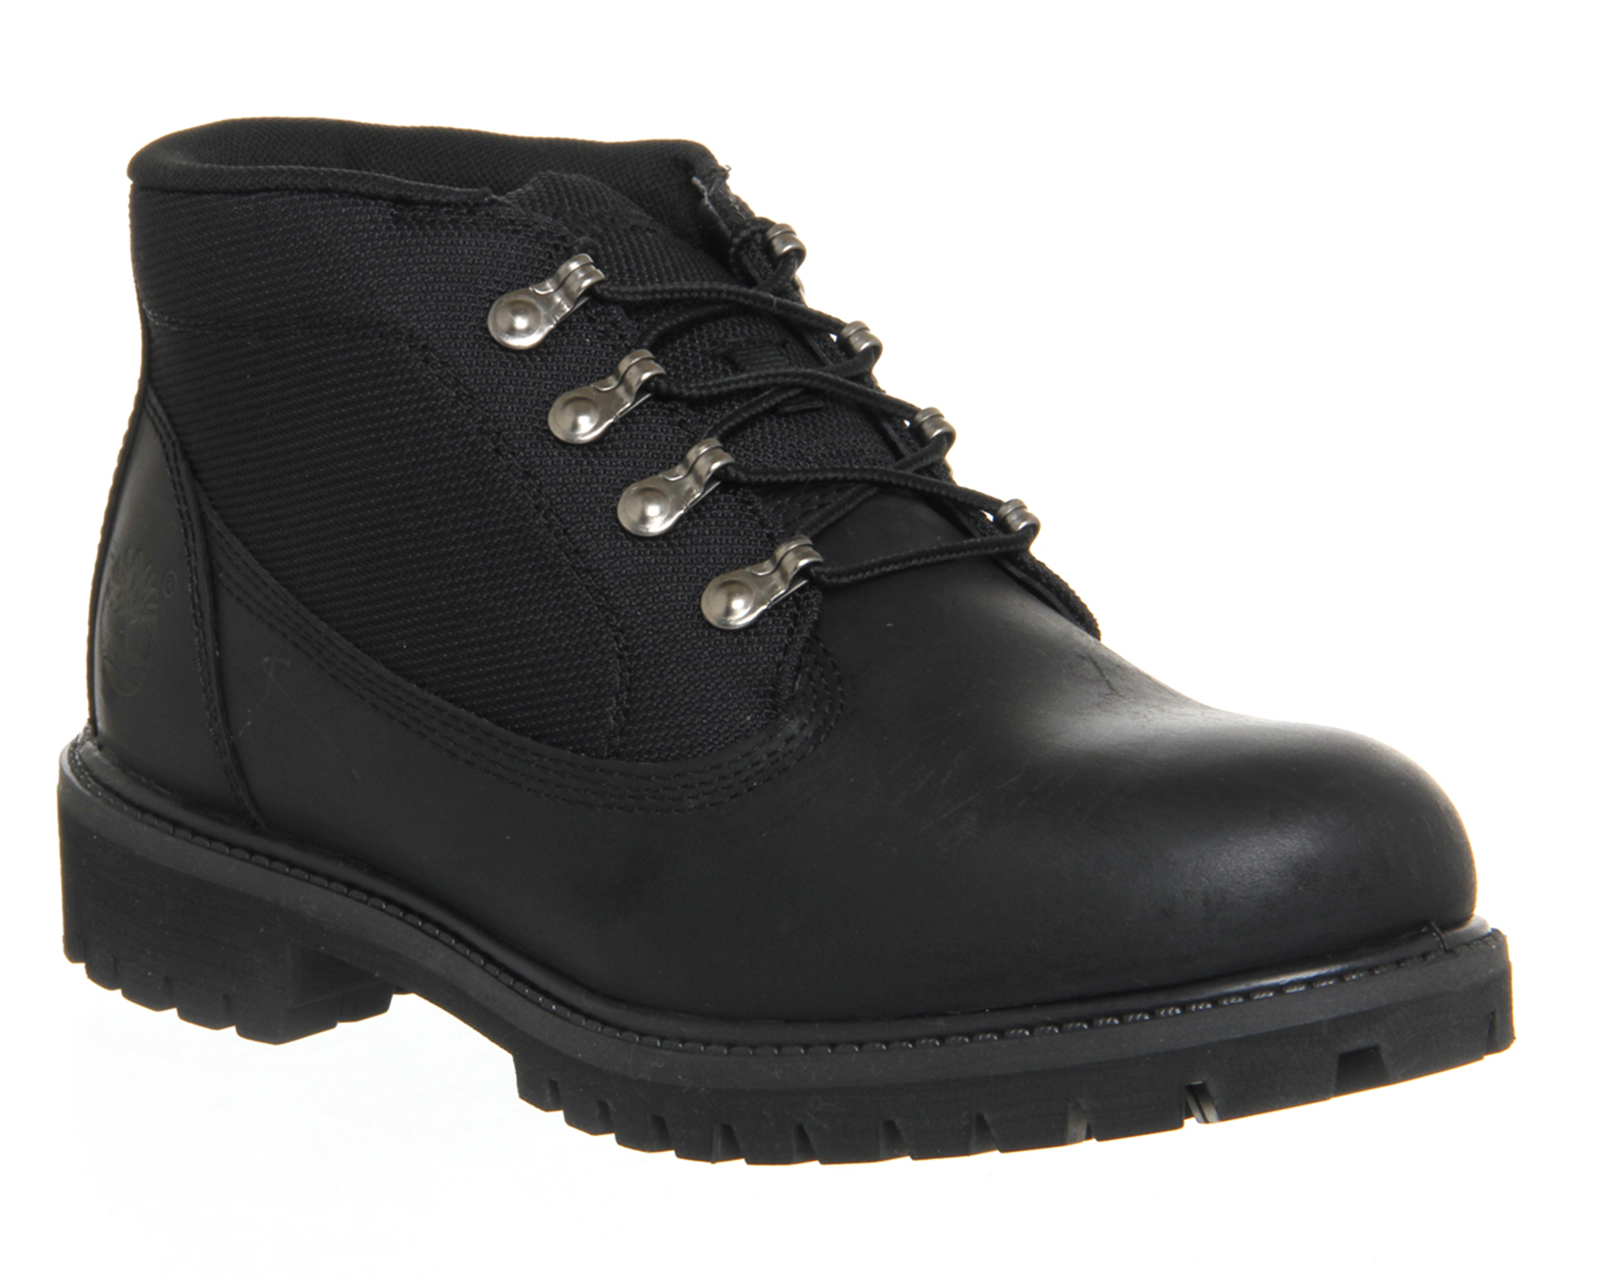 mens timberland csite black recanvas leather boots uk